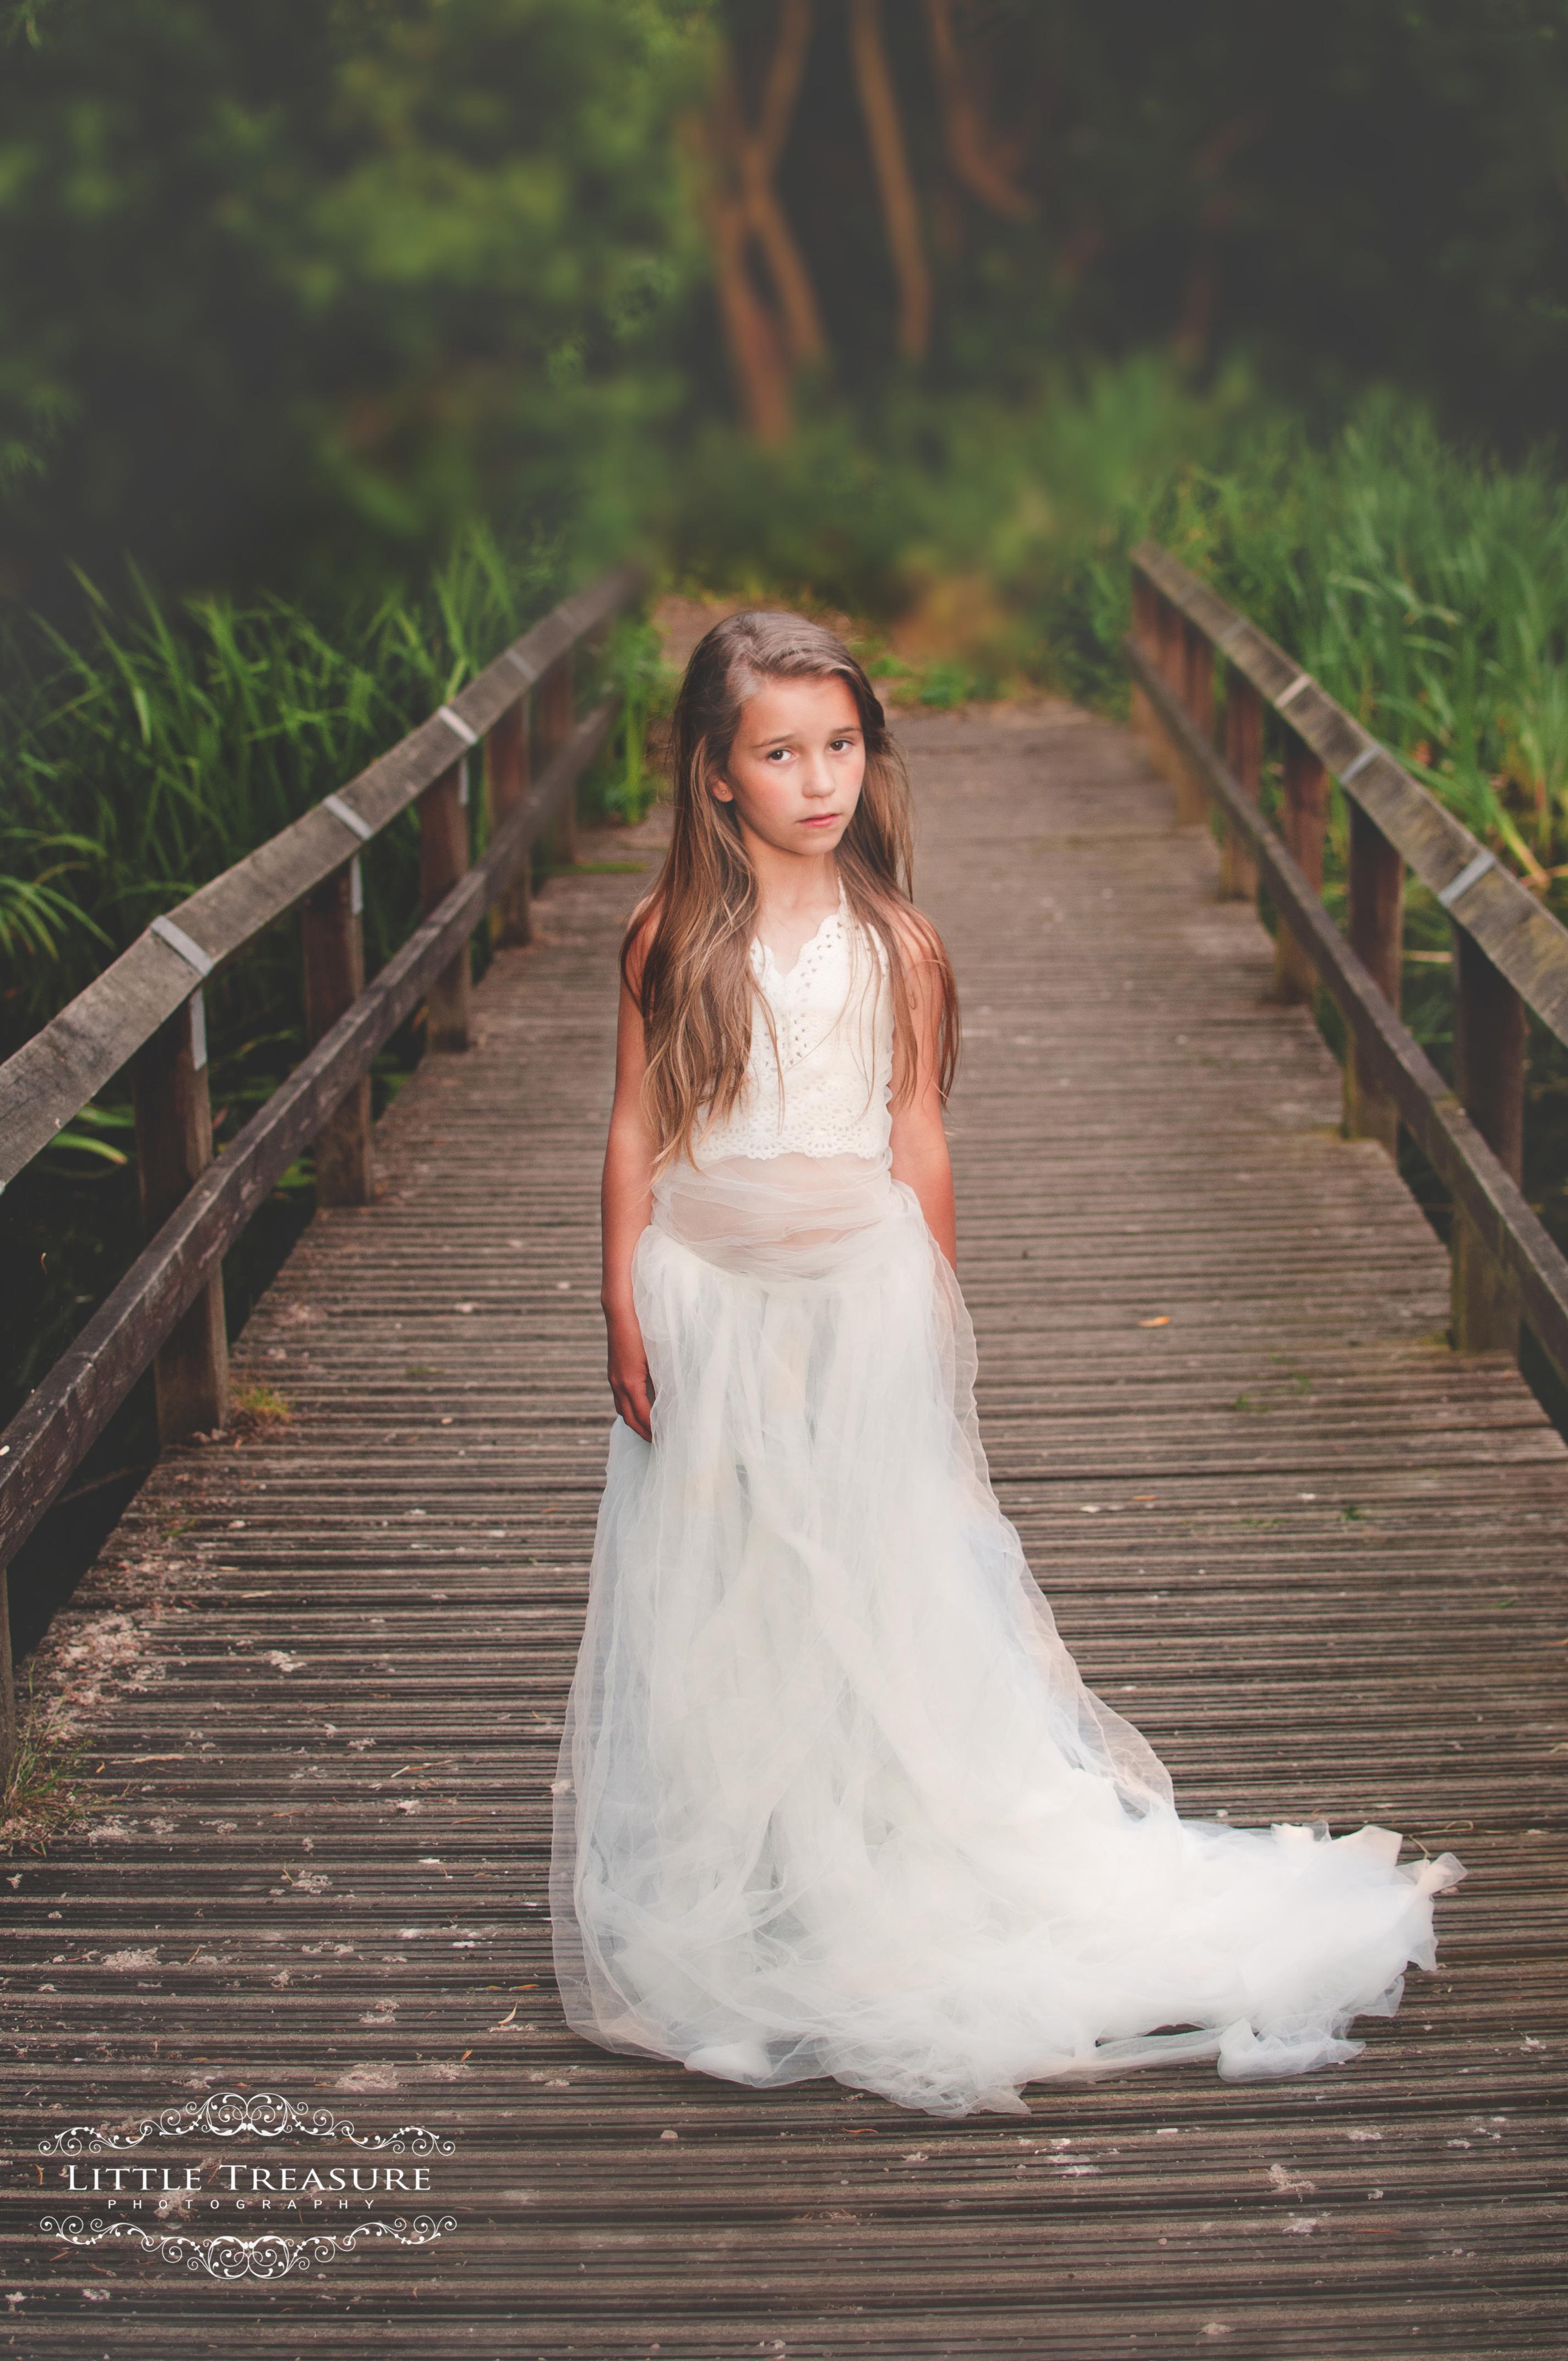 Dagenham photographer